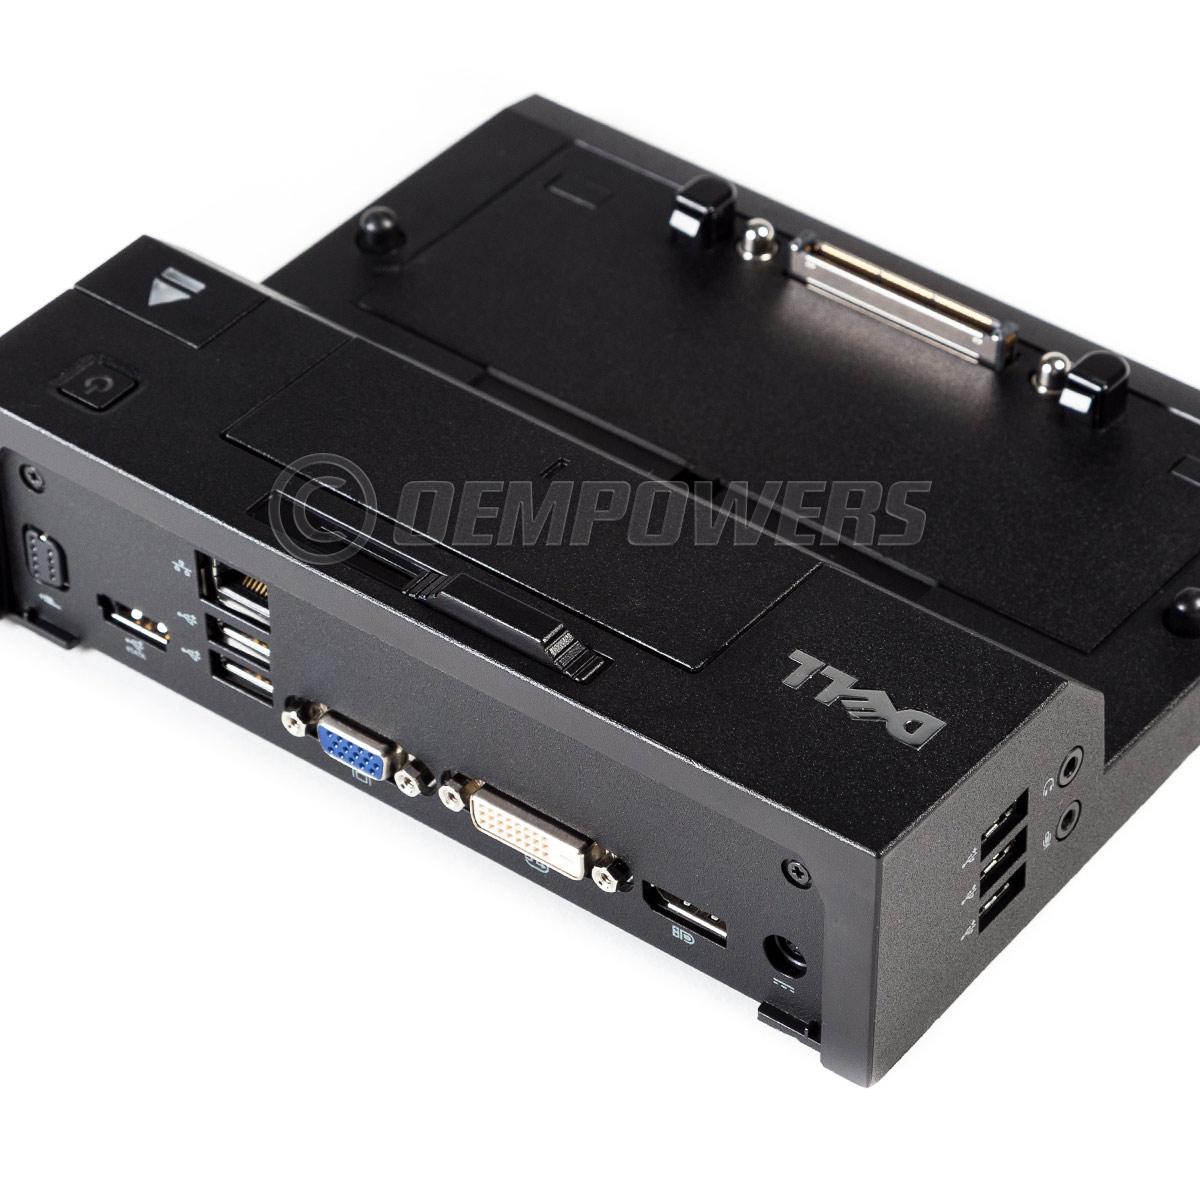 Dell e port replicator docking station with pa 7e 210 watt ac power adapter ebay - Docking station port replicator ...